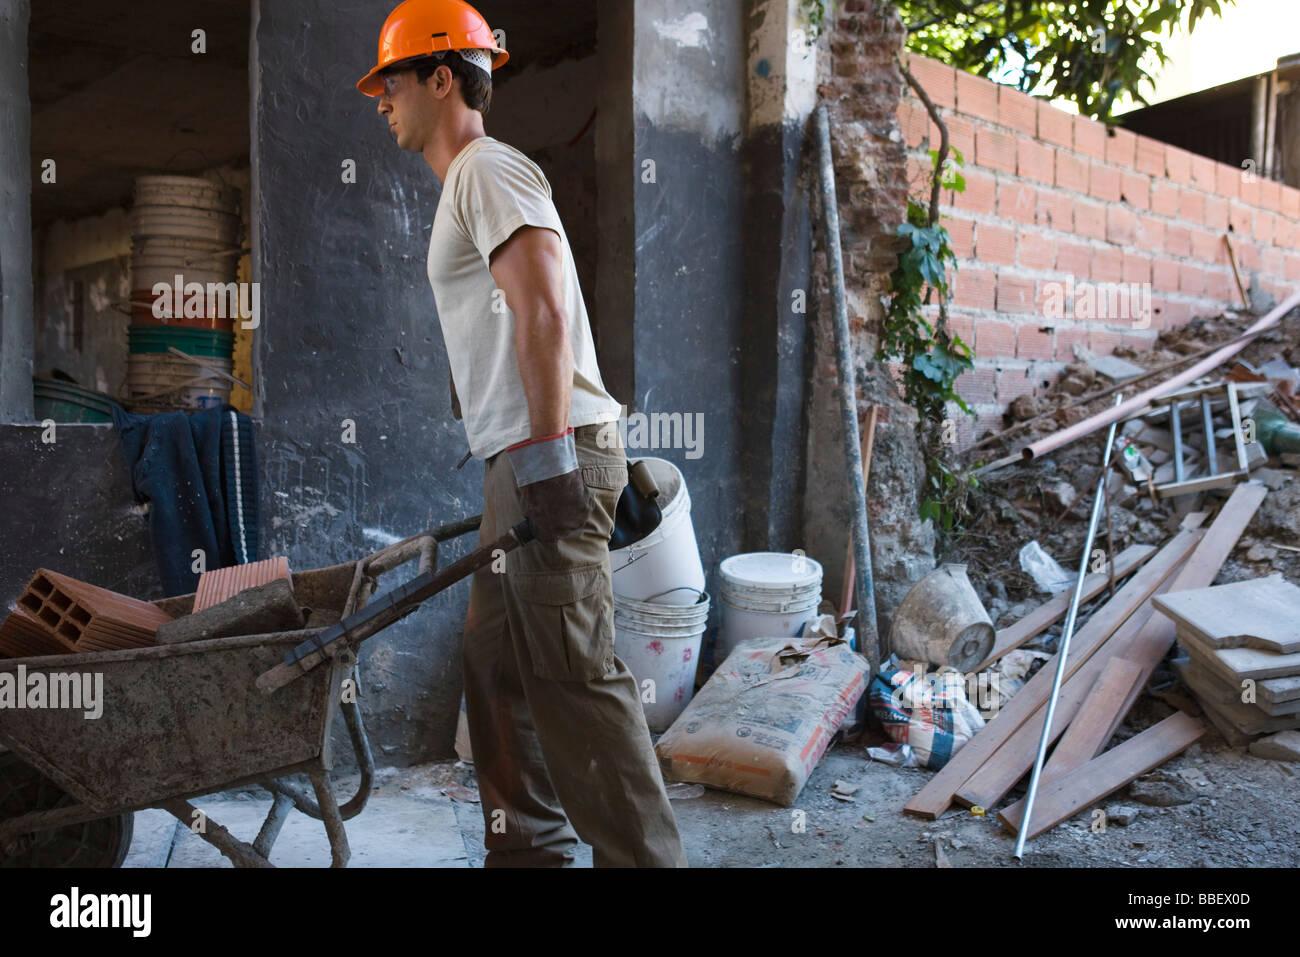 Construction worker moving wheelbarrow through construction site - Stock Image